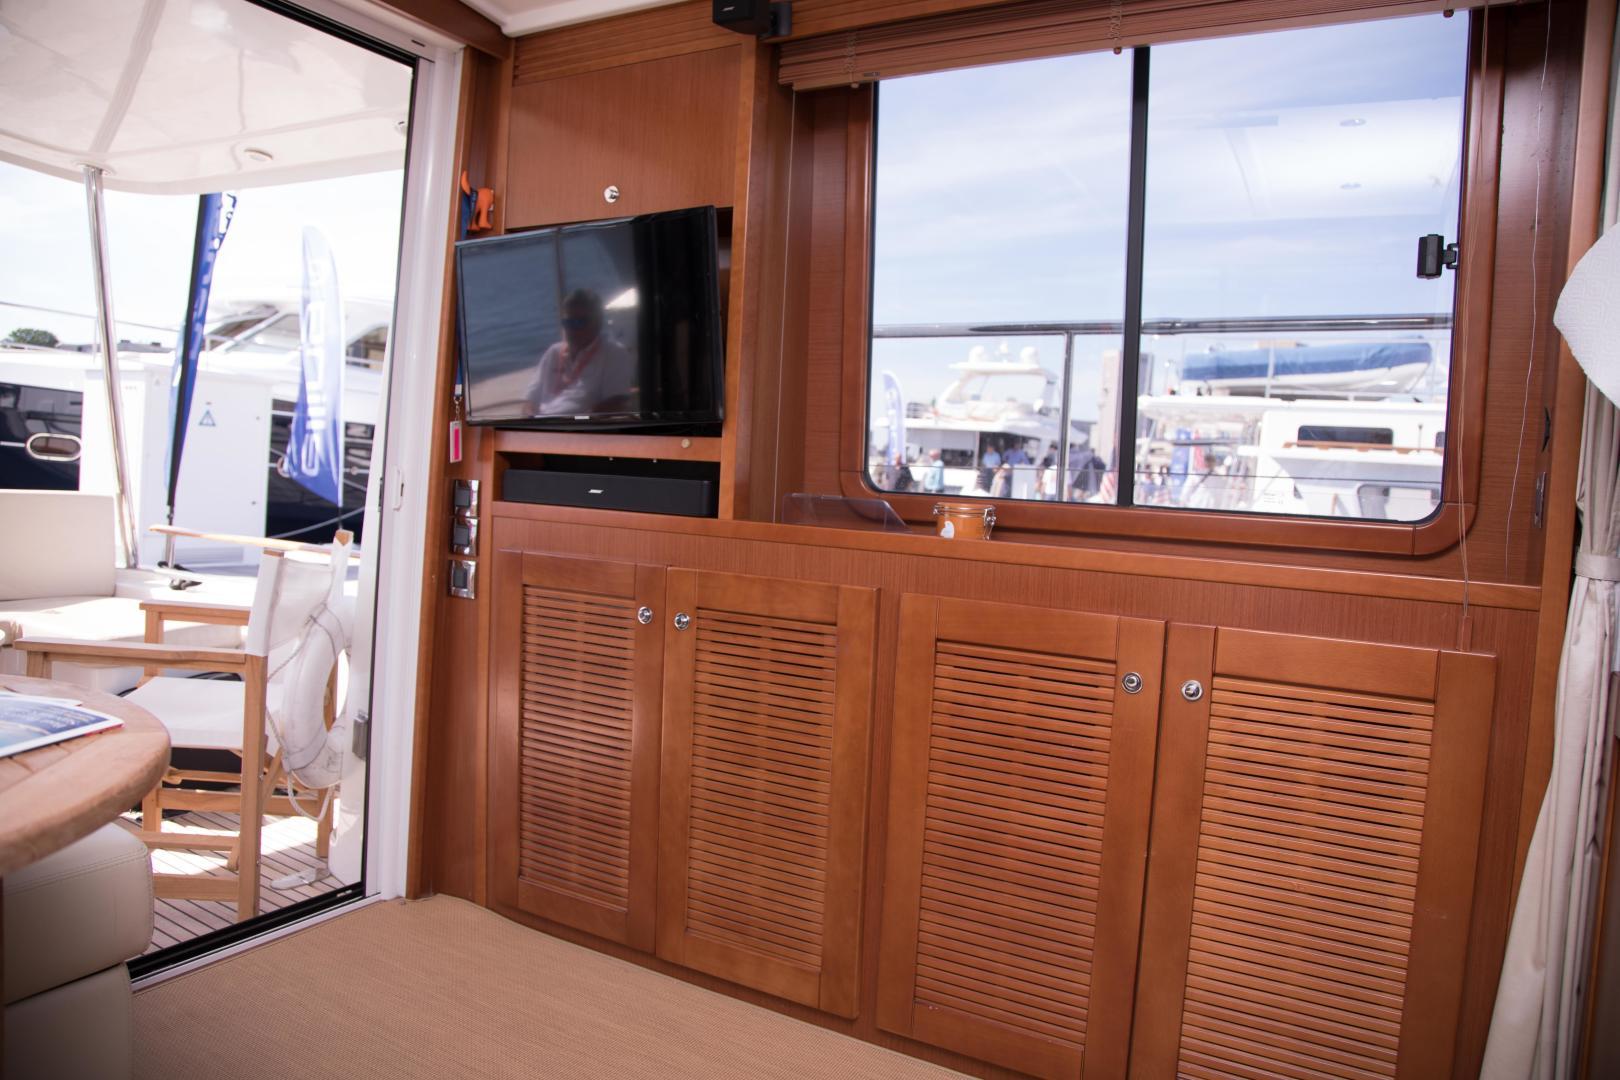 Beneteau-Swift Trawler 2012-MLC IV Baltimore-Maryland-United States-1355974 | Thumbnail